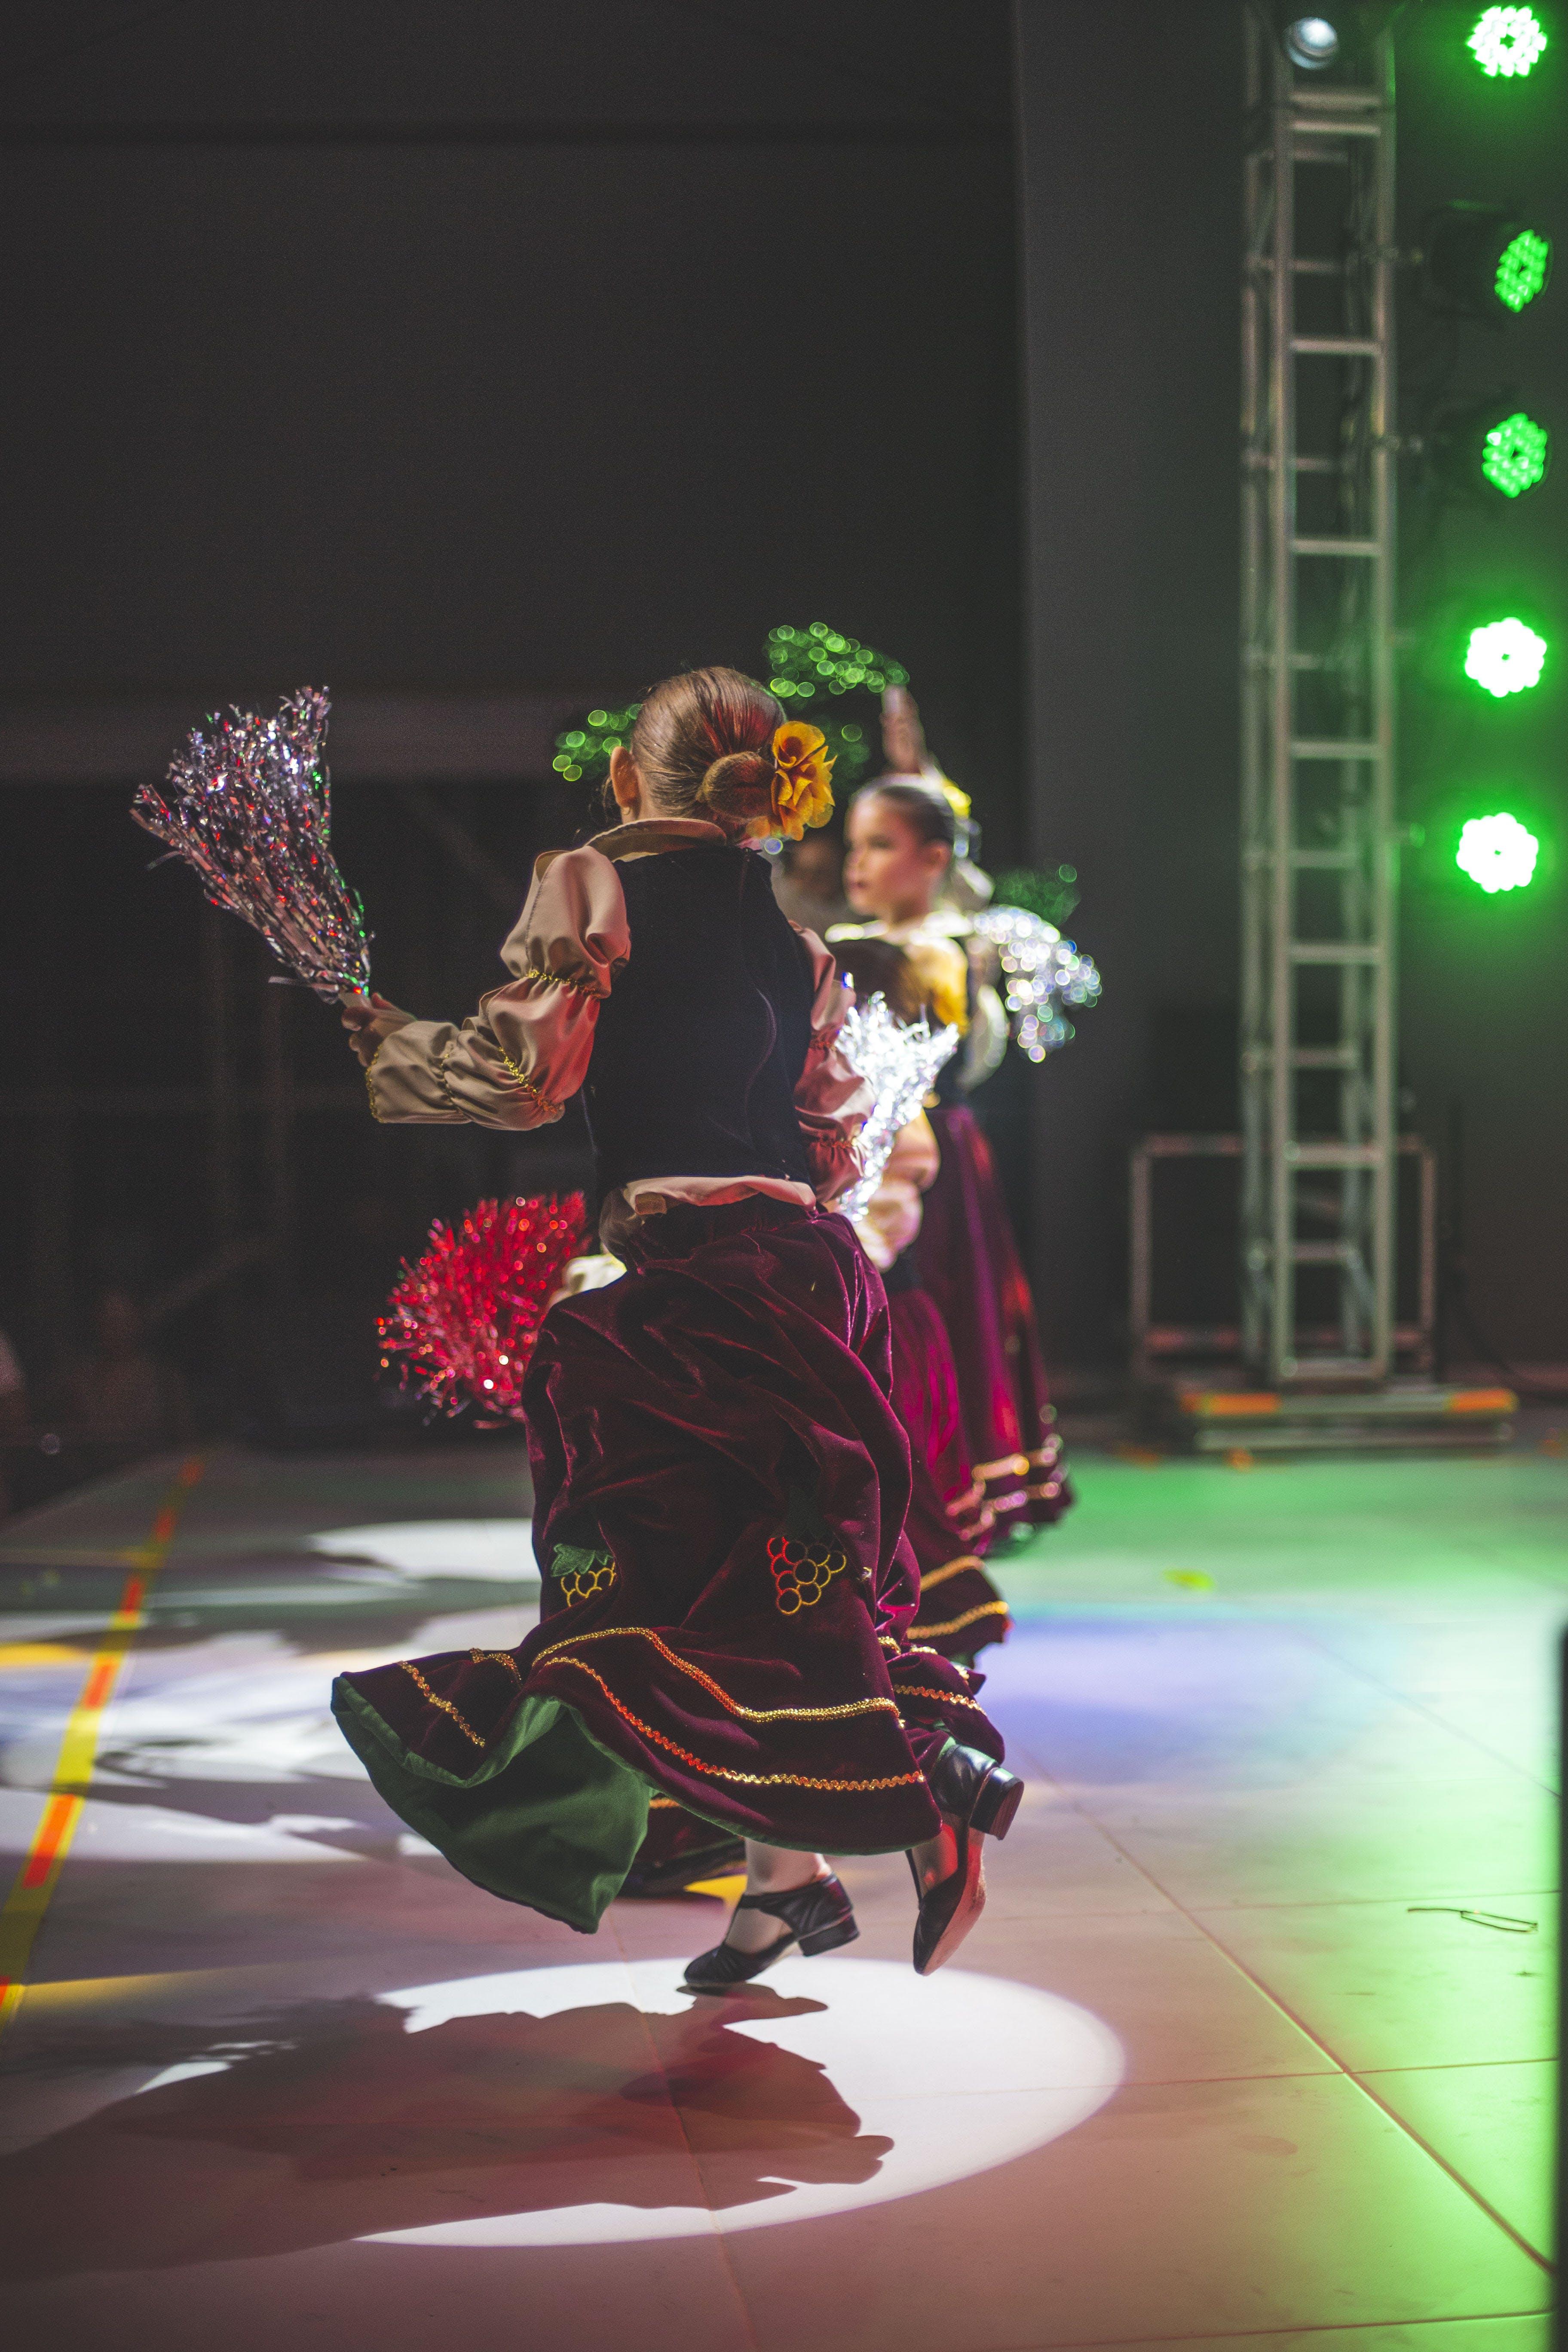 Foto stok gratis bergerak, dance, festival, istri